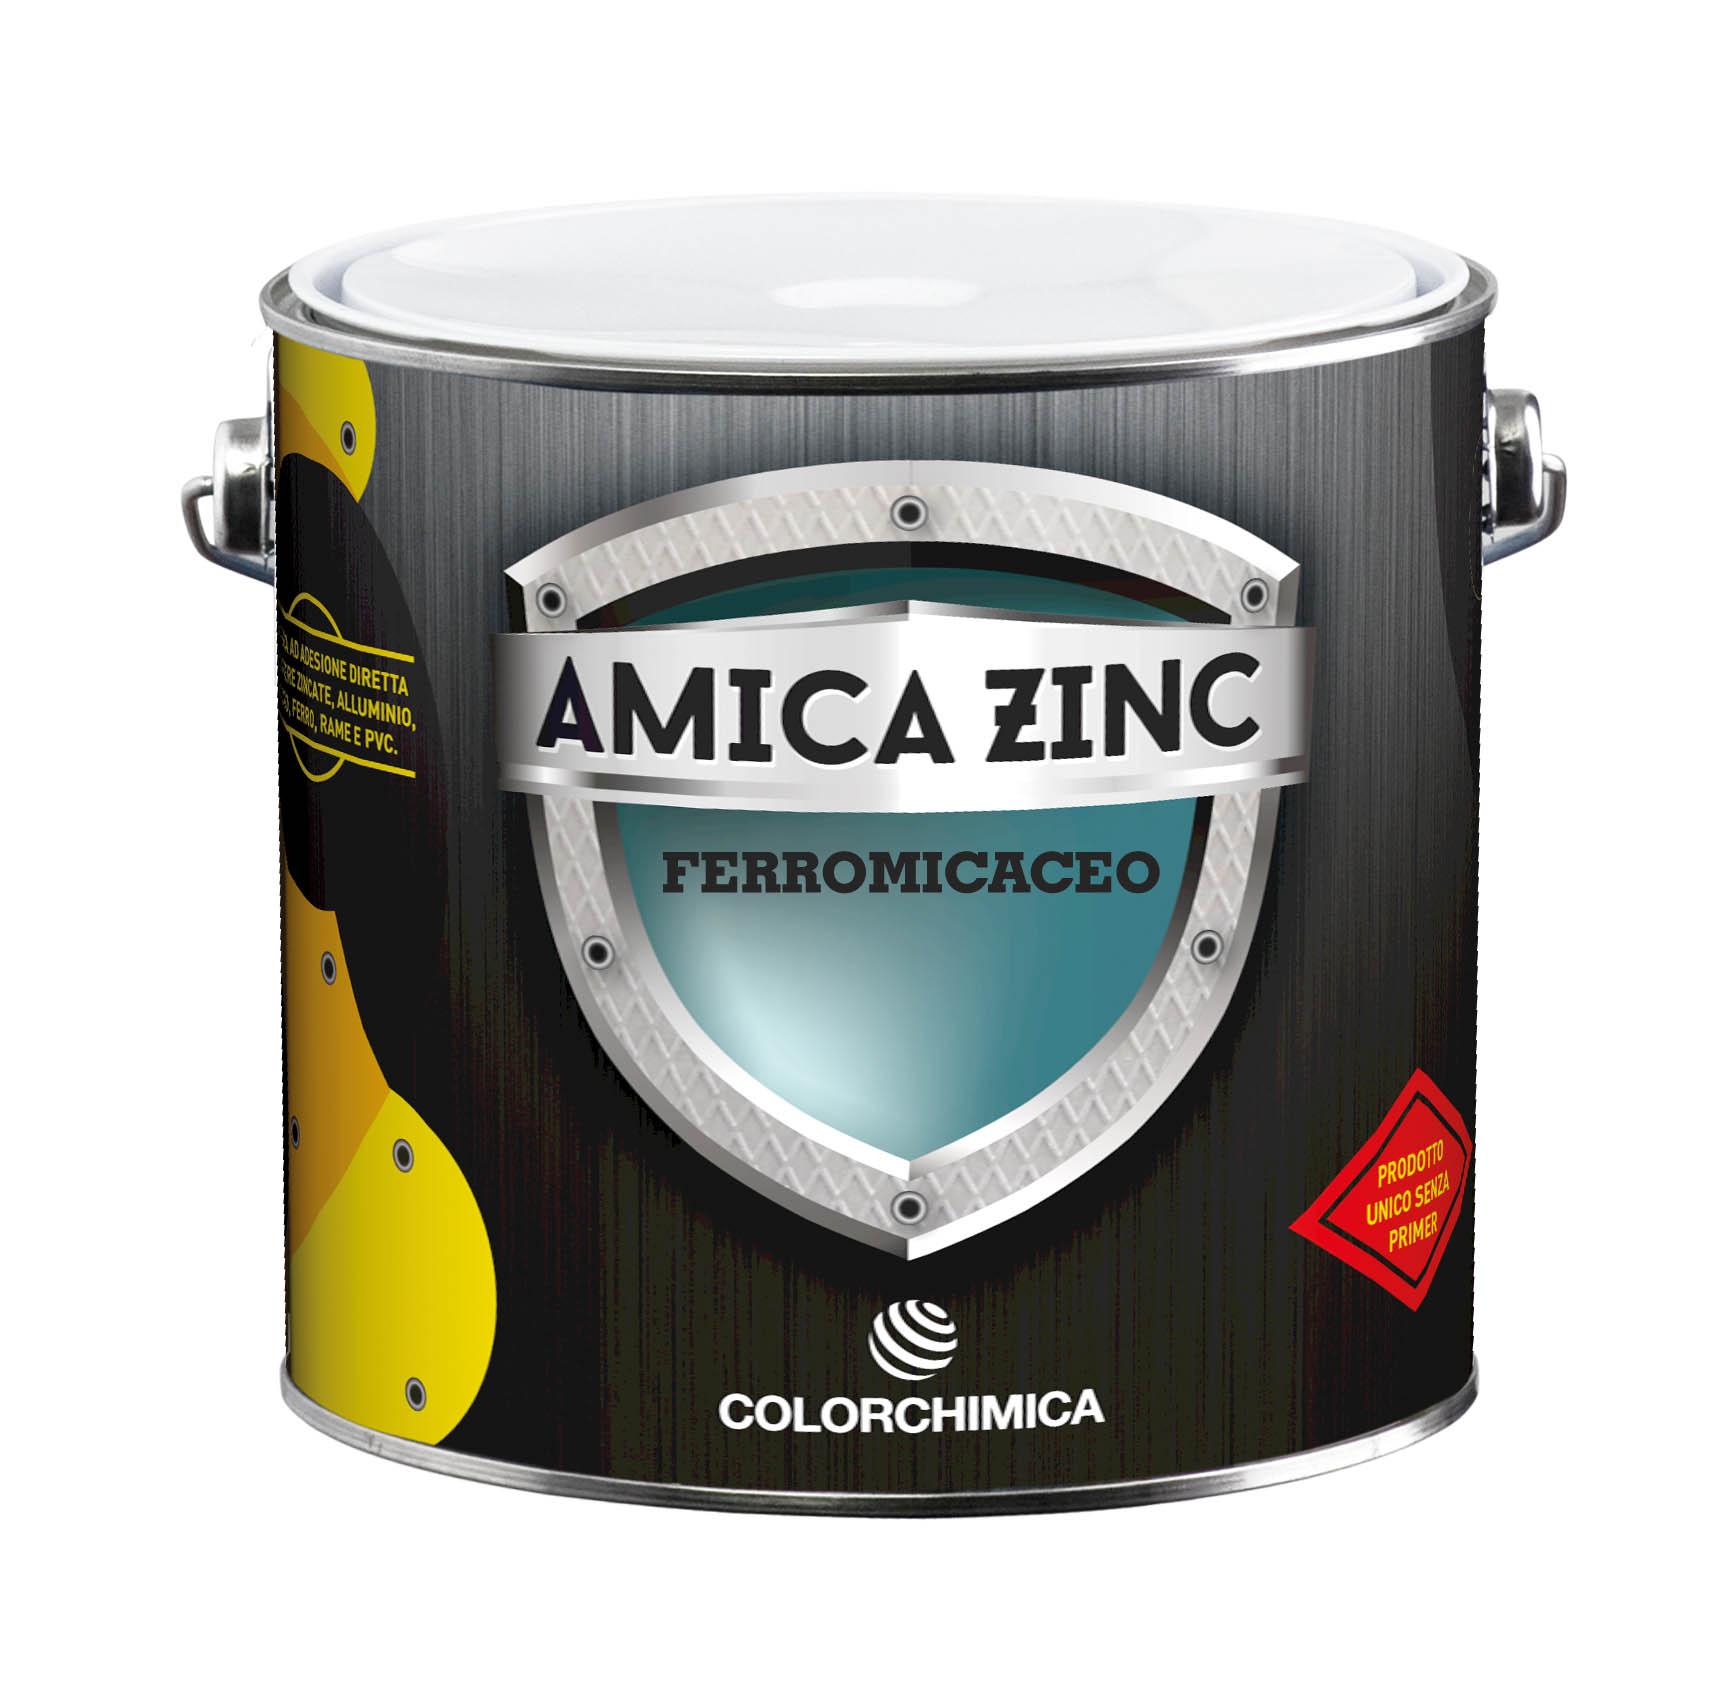 Amica Zinc 2,5l 3D Preview FERROMICACEO